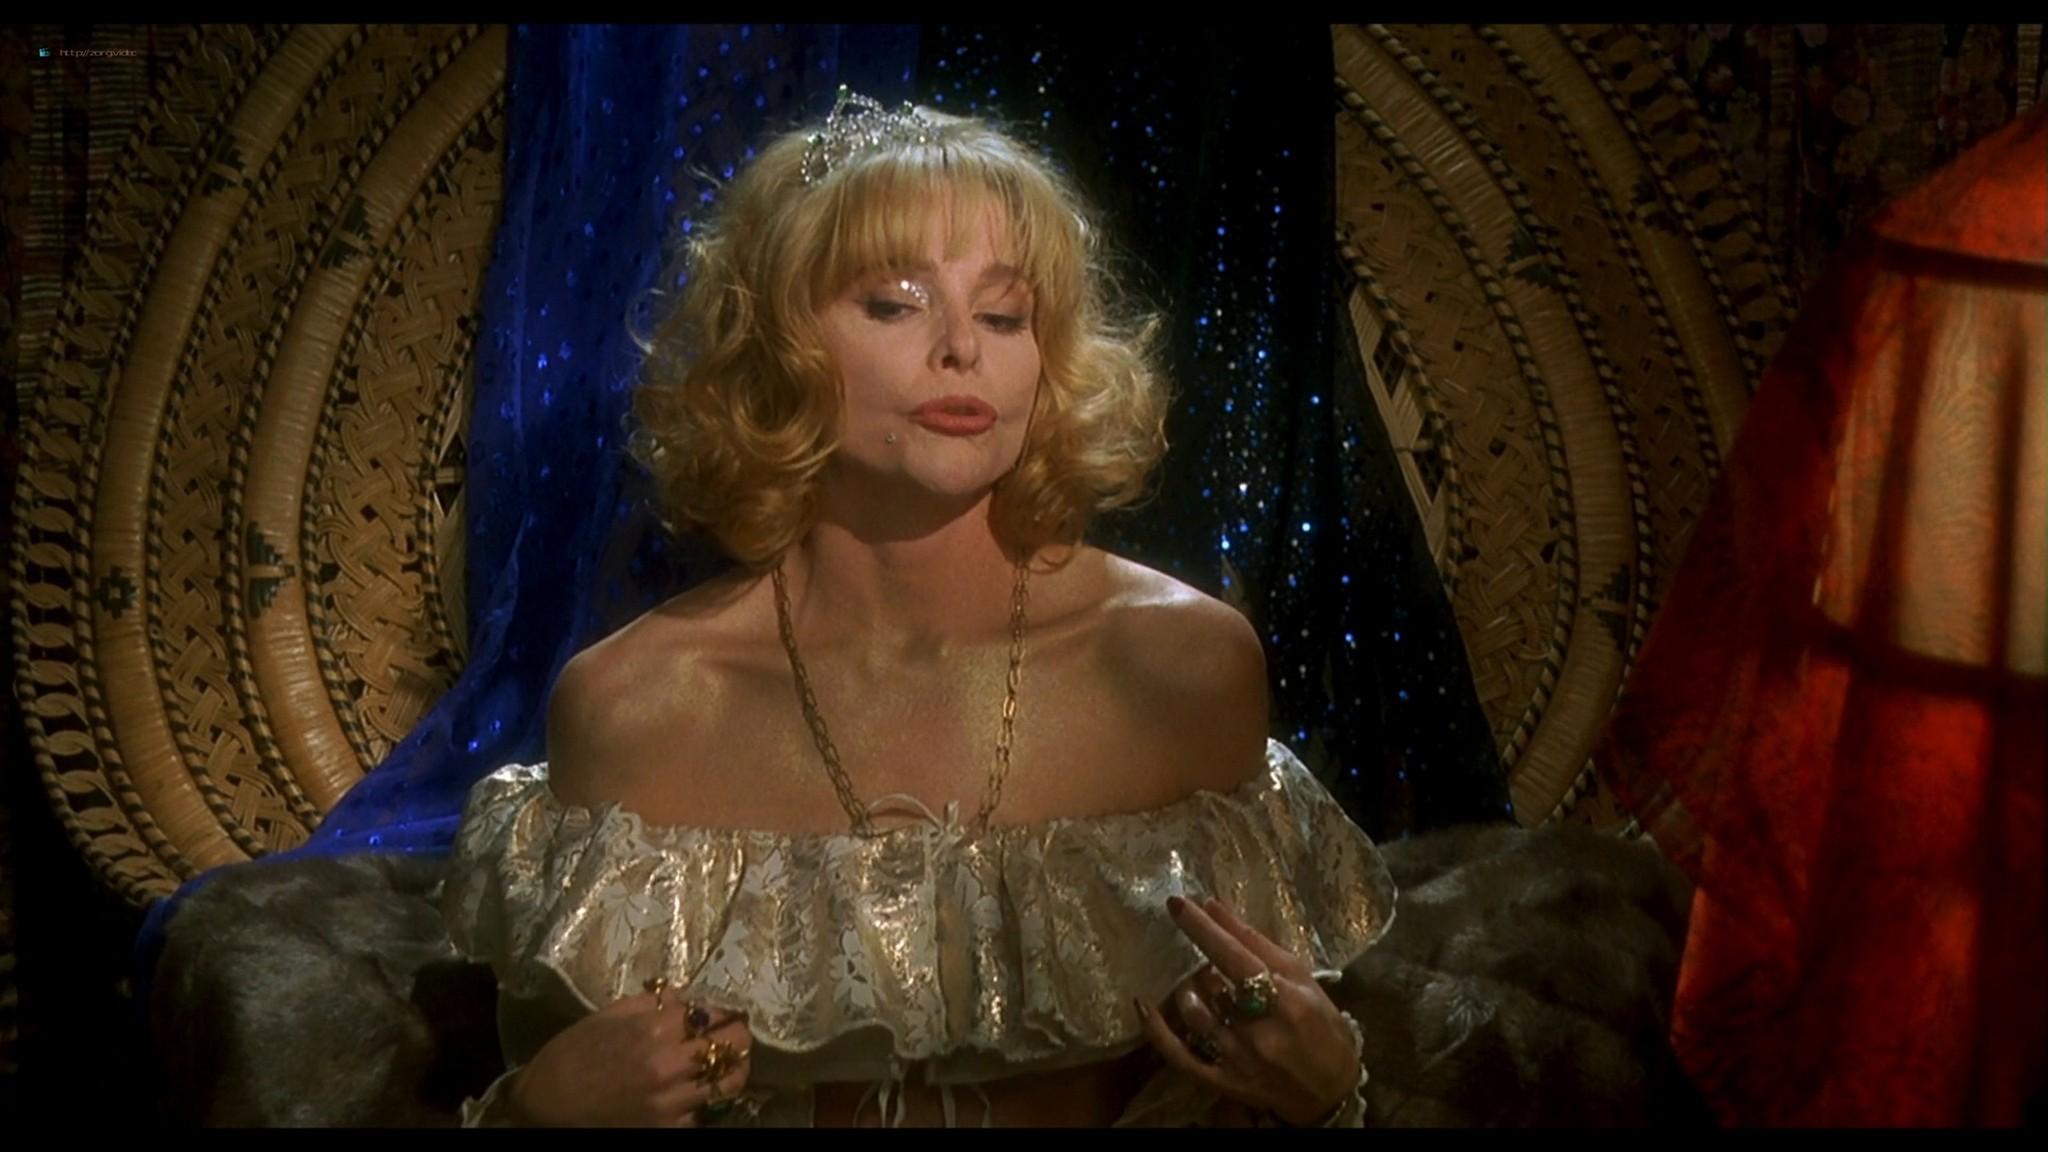 Joey Lauren Adams nude Priscilla Barnes nude topless - Mallrats (1995) HD 1080p BluRay (11)